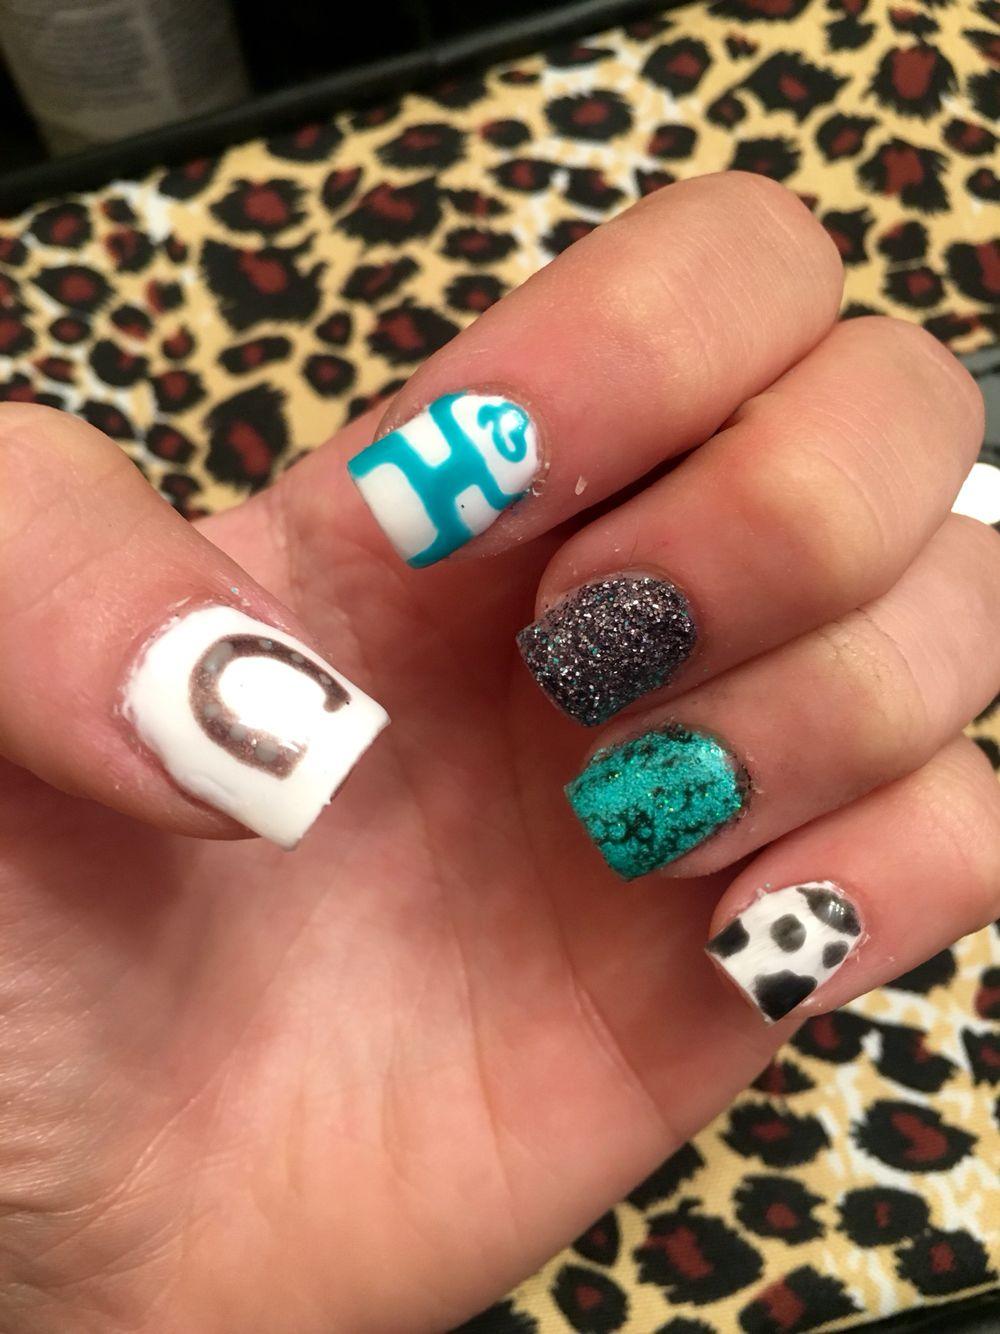 Country Girl - Nail Art Gallery | :: Nail Art :: | Pinterest | Girls nails,  Nail art galleries and Country girls - Country Girl - Nail Art Gallery :: Nail Art :: Pinterest Girls